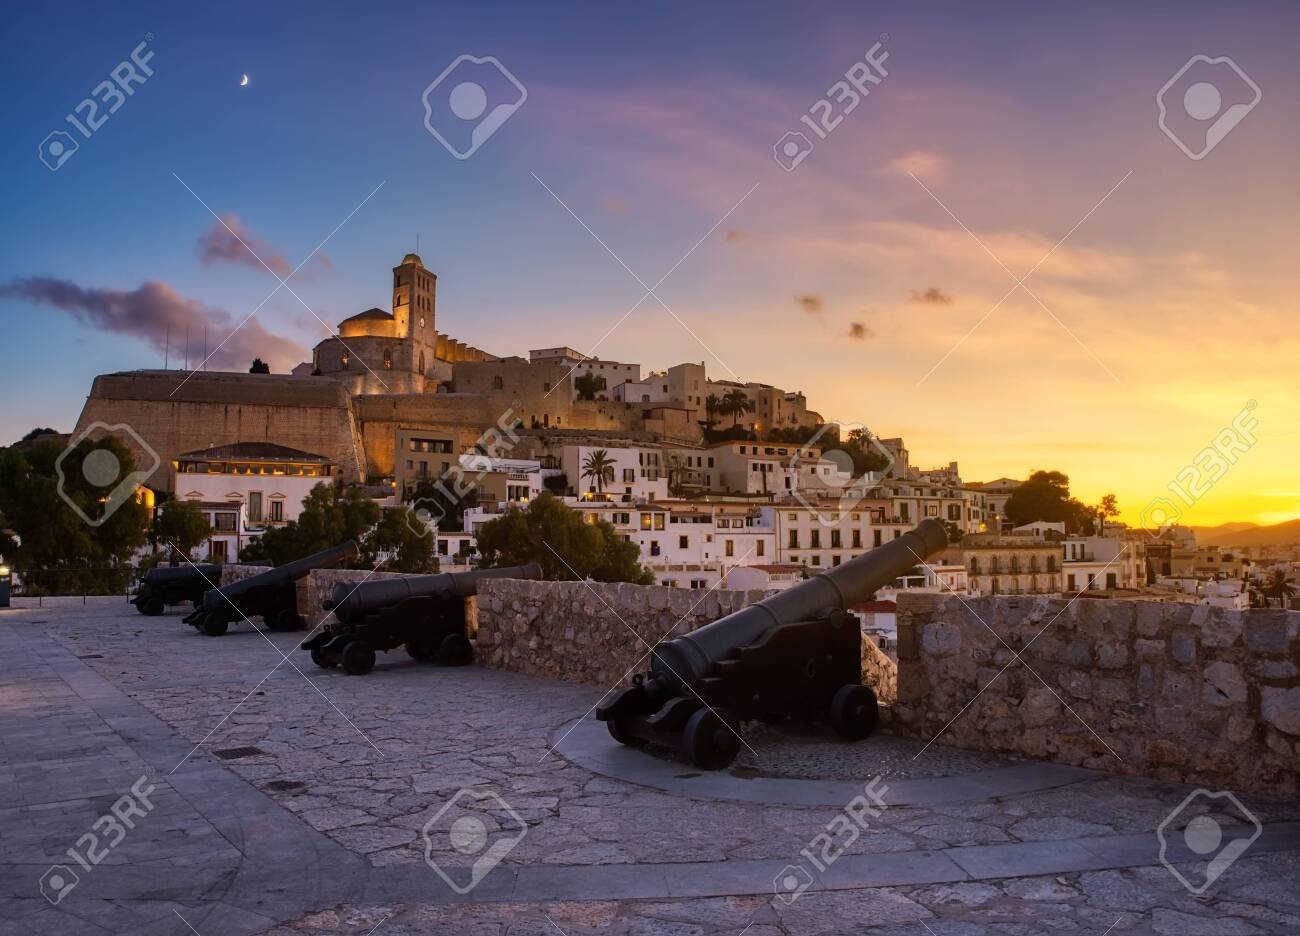 beautiful sunset in the historic area of Dalt Vila in Ibiza, Balearics, Spain - 142802923